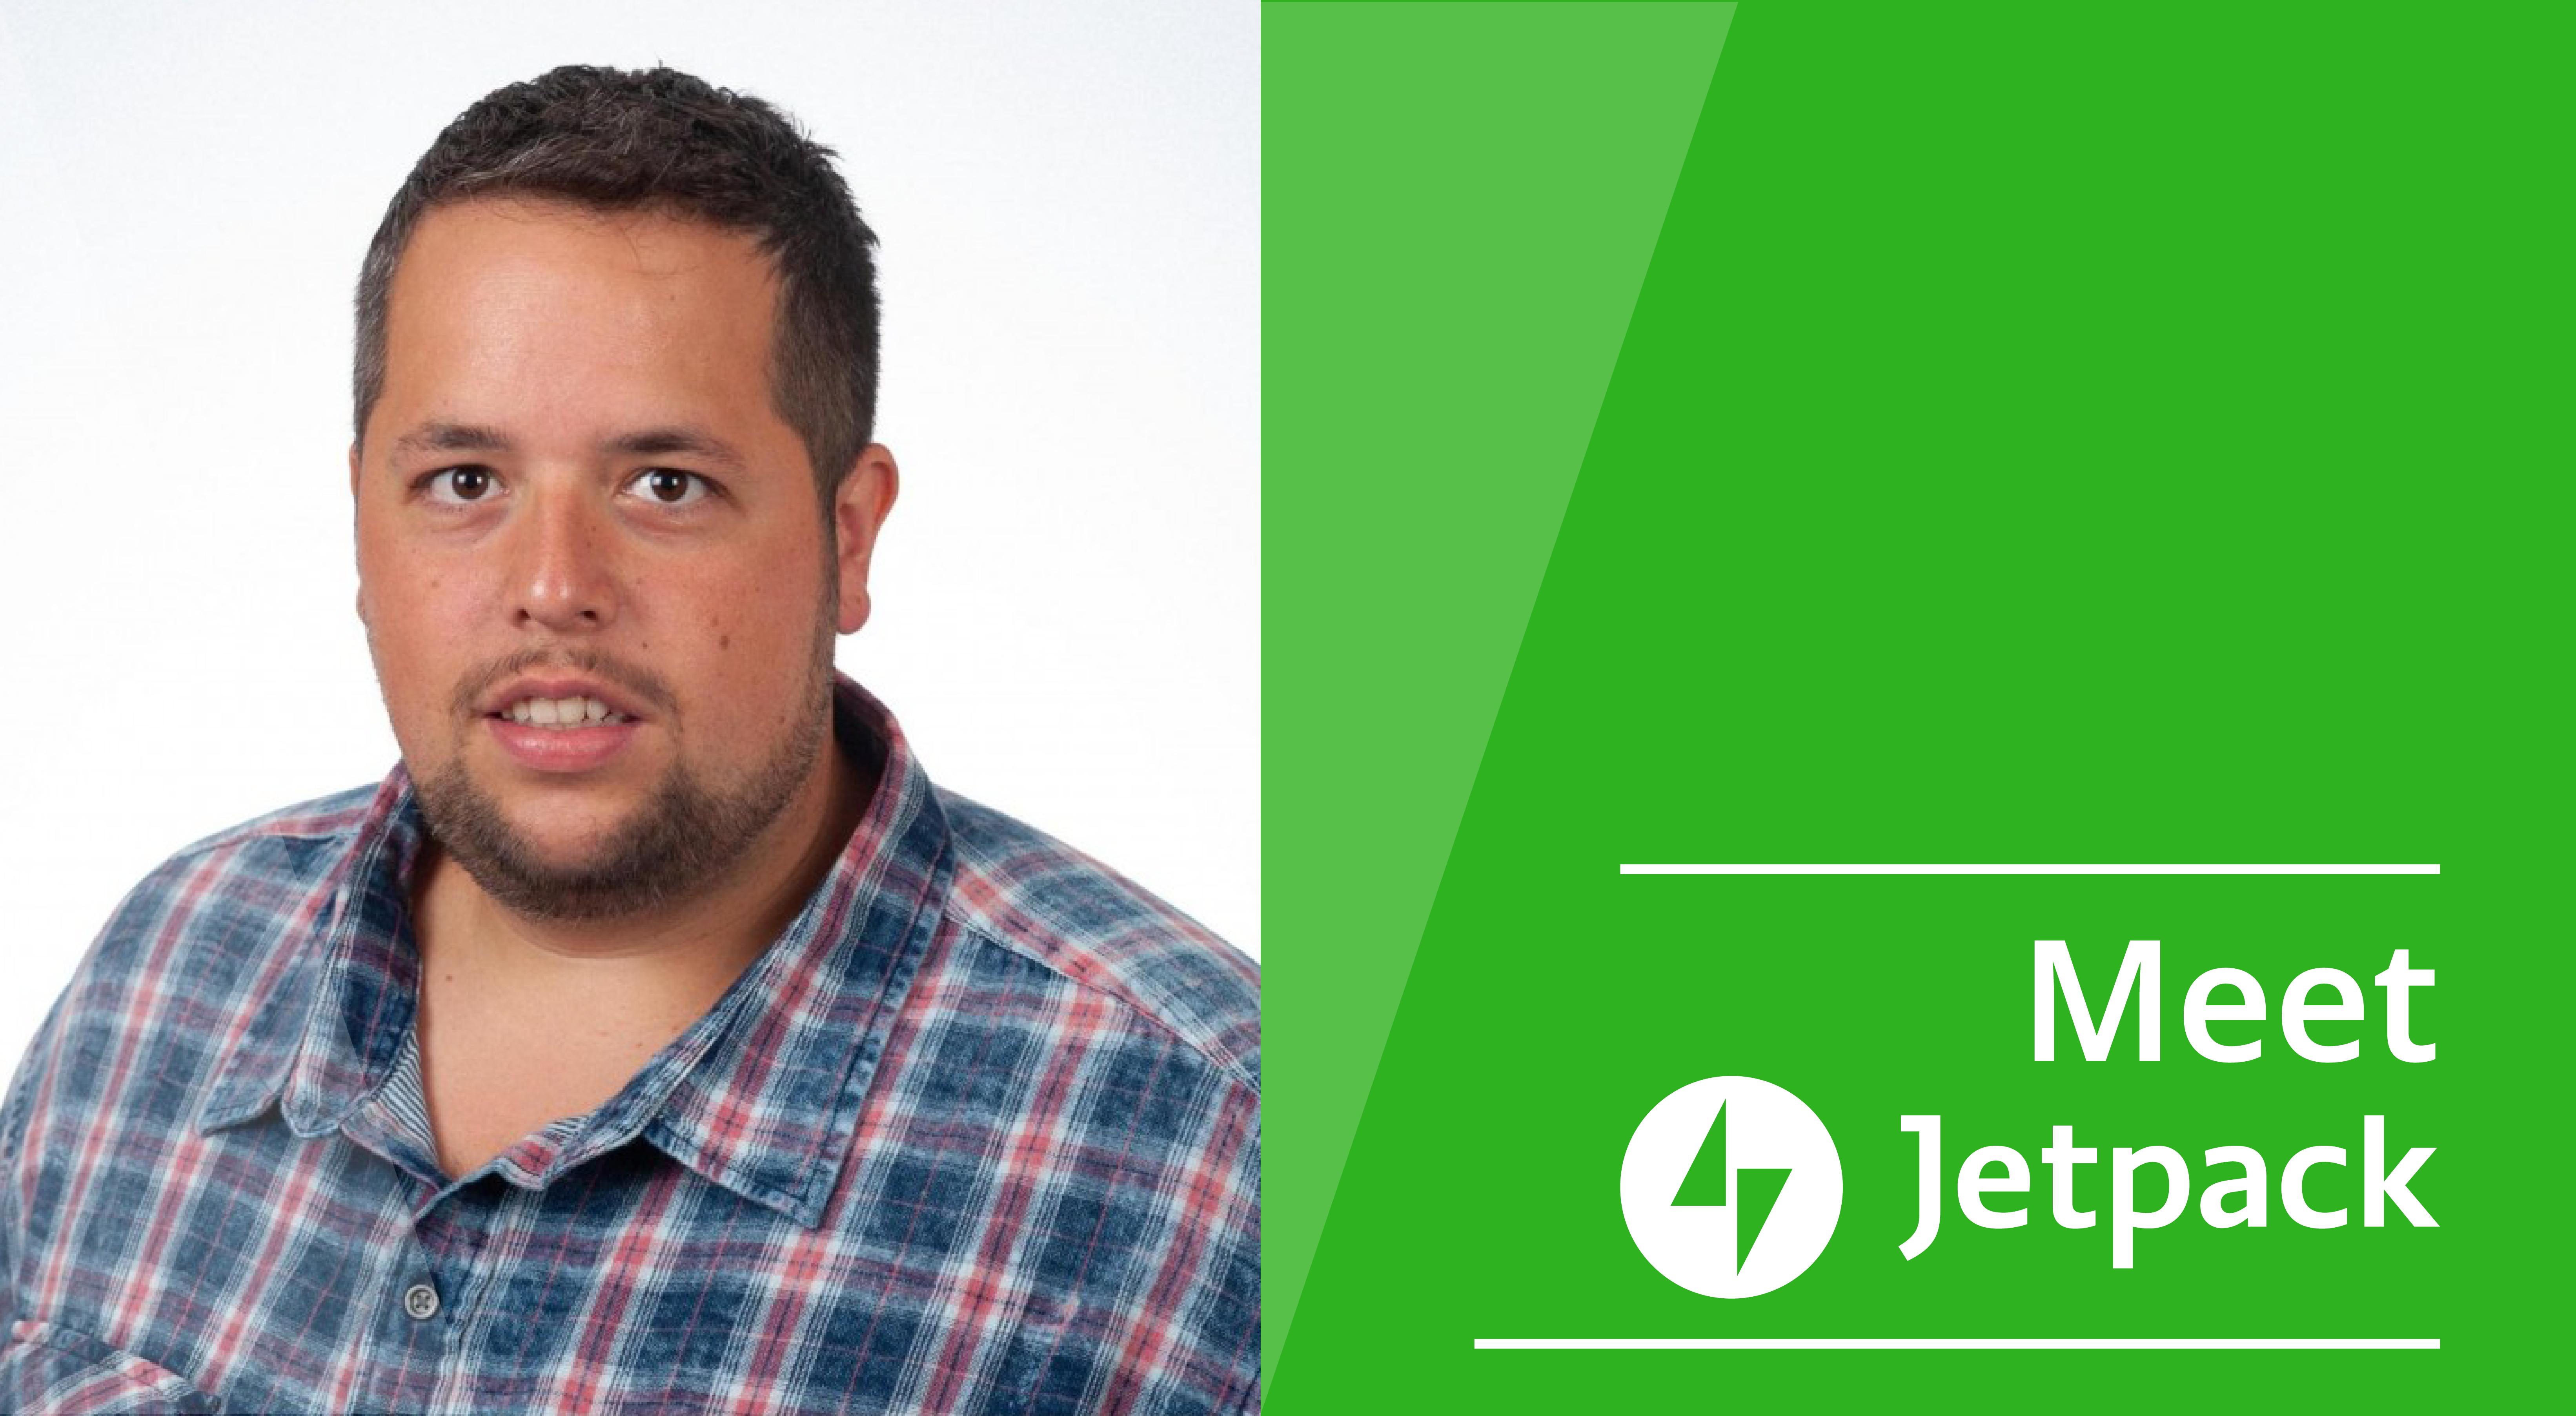 Meet Jesse from Jetpack: Director of Innovation, Entrepreneur, Writer, and Botnet Fighter